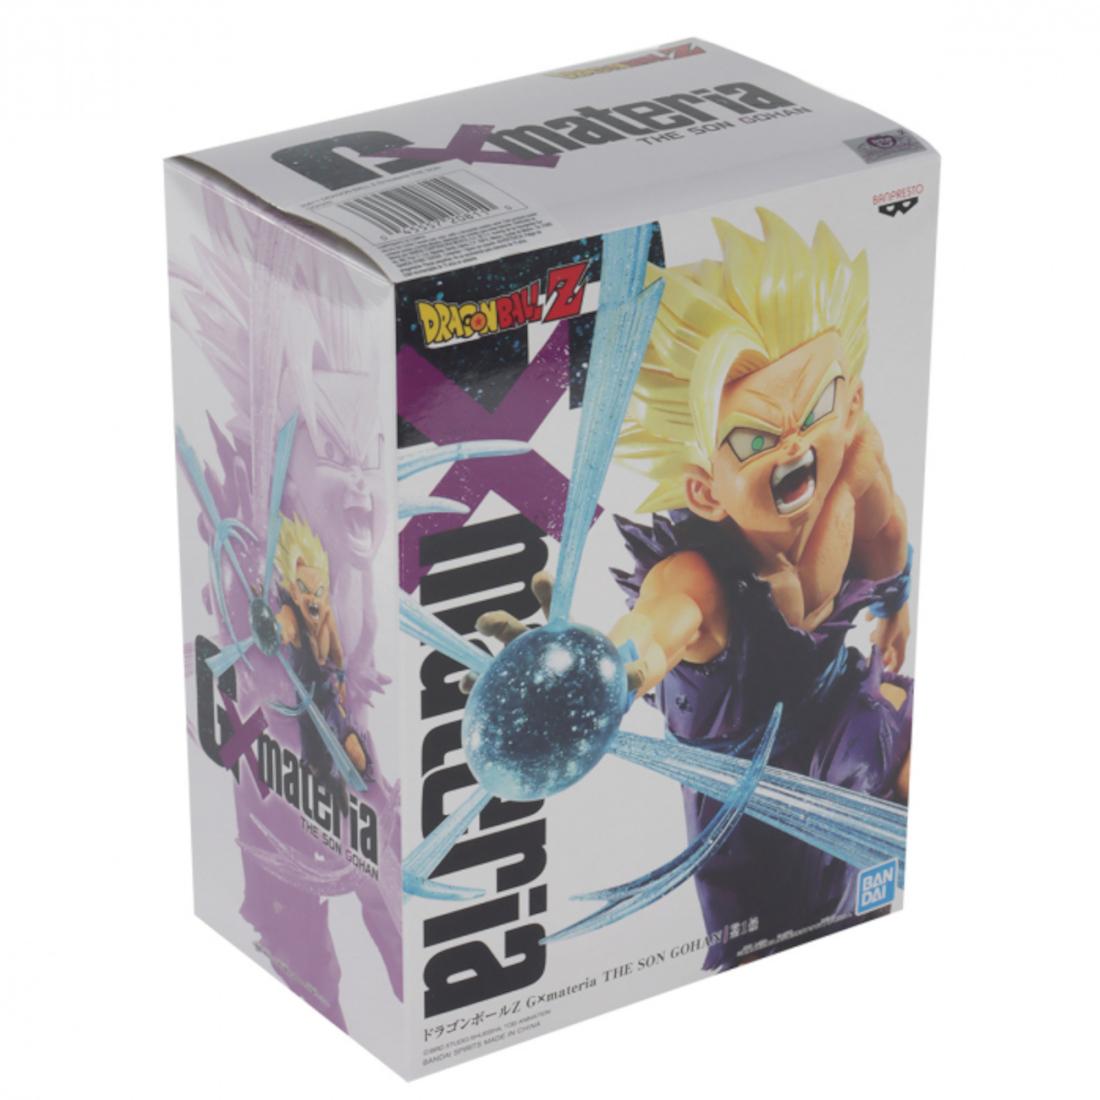 Banpresto Dragon Ball Z G X Materia The Son Gohan